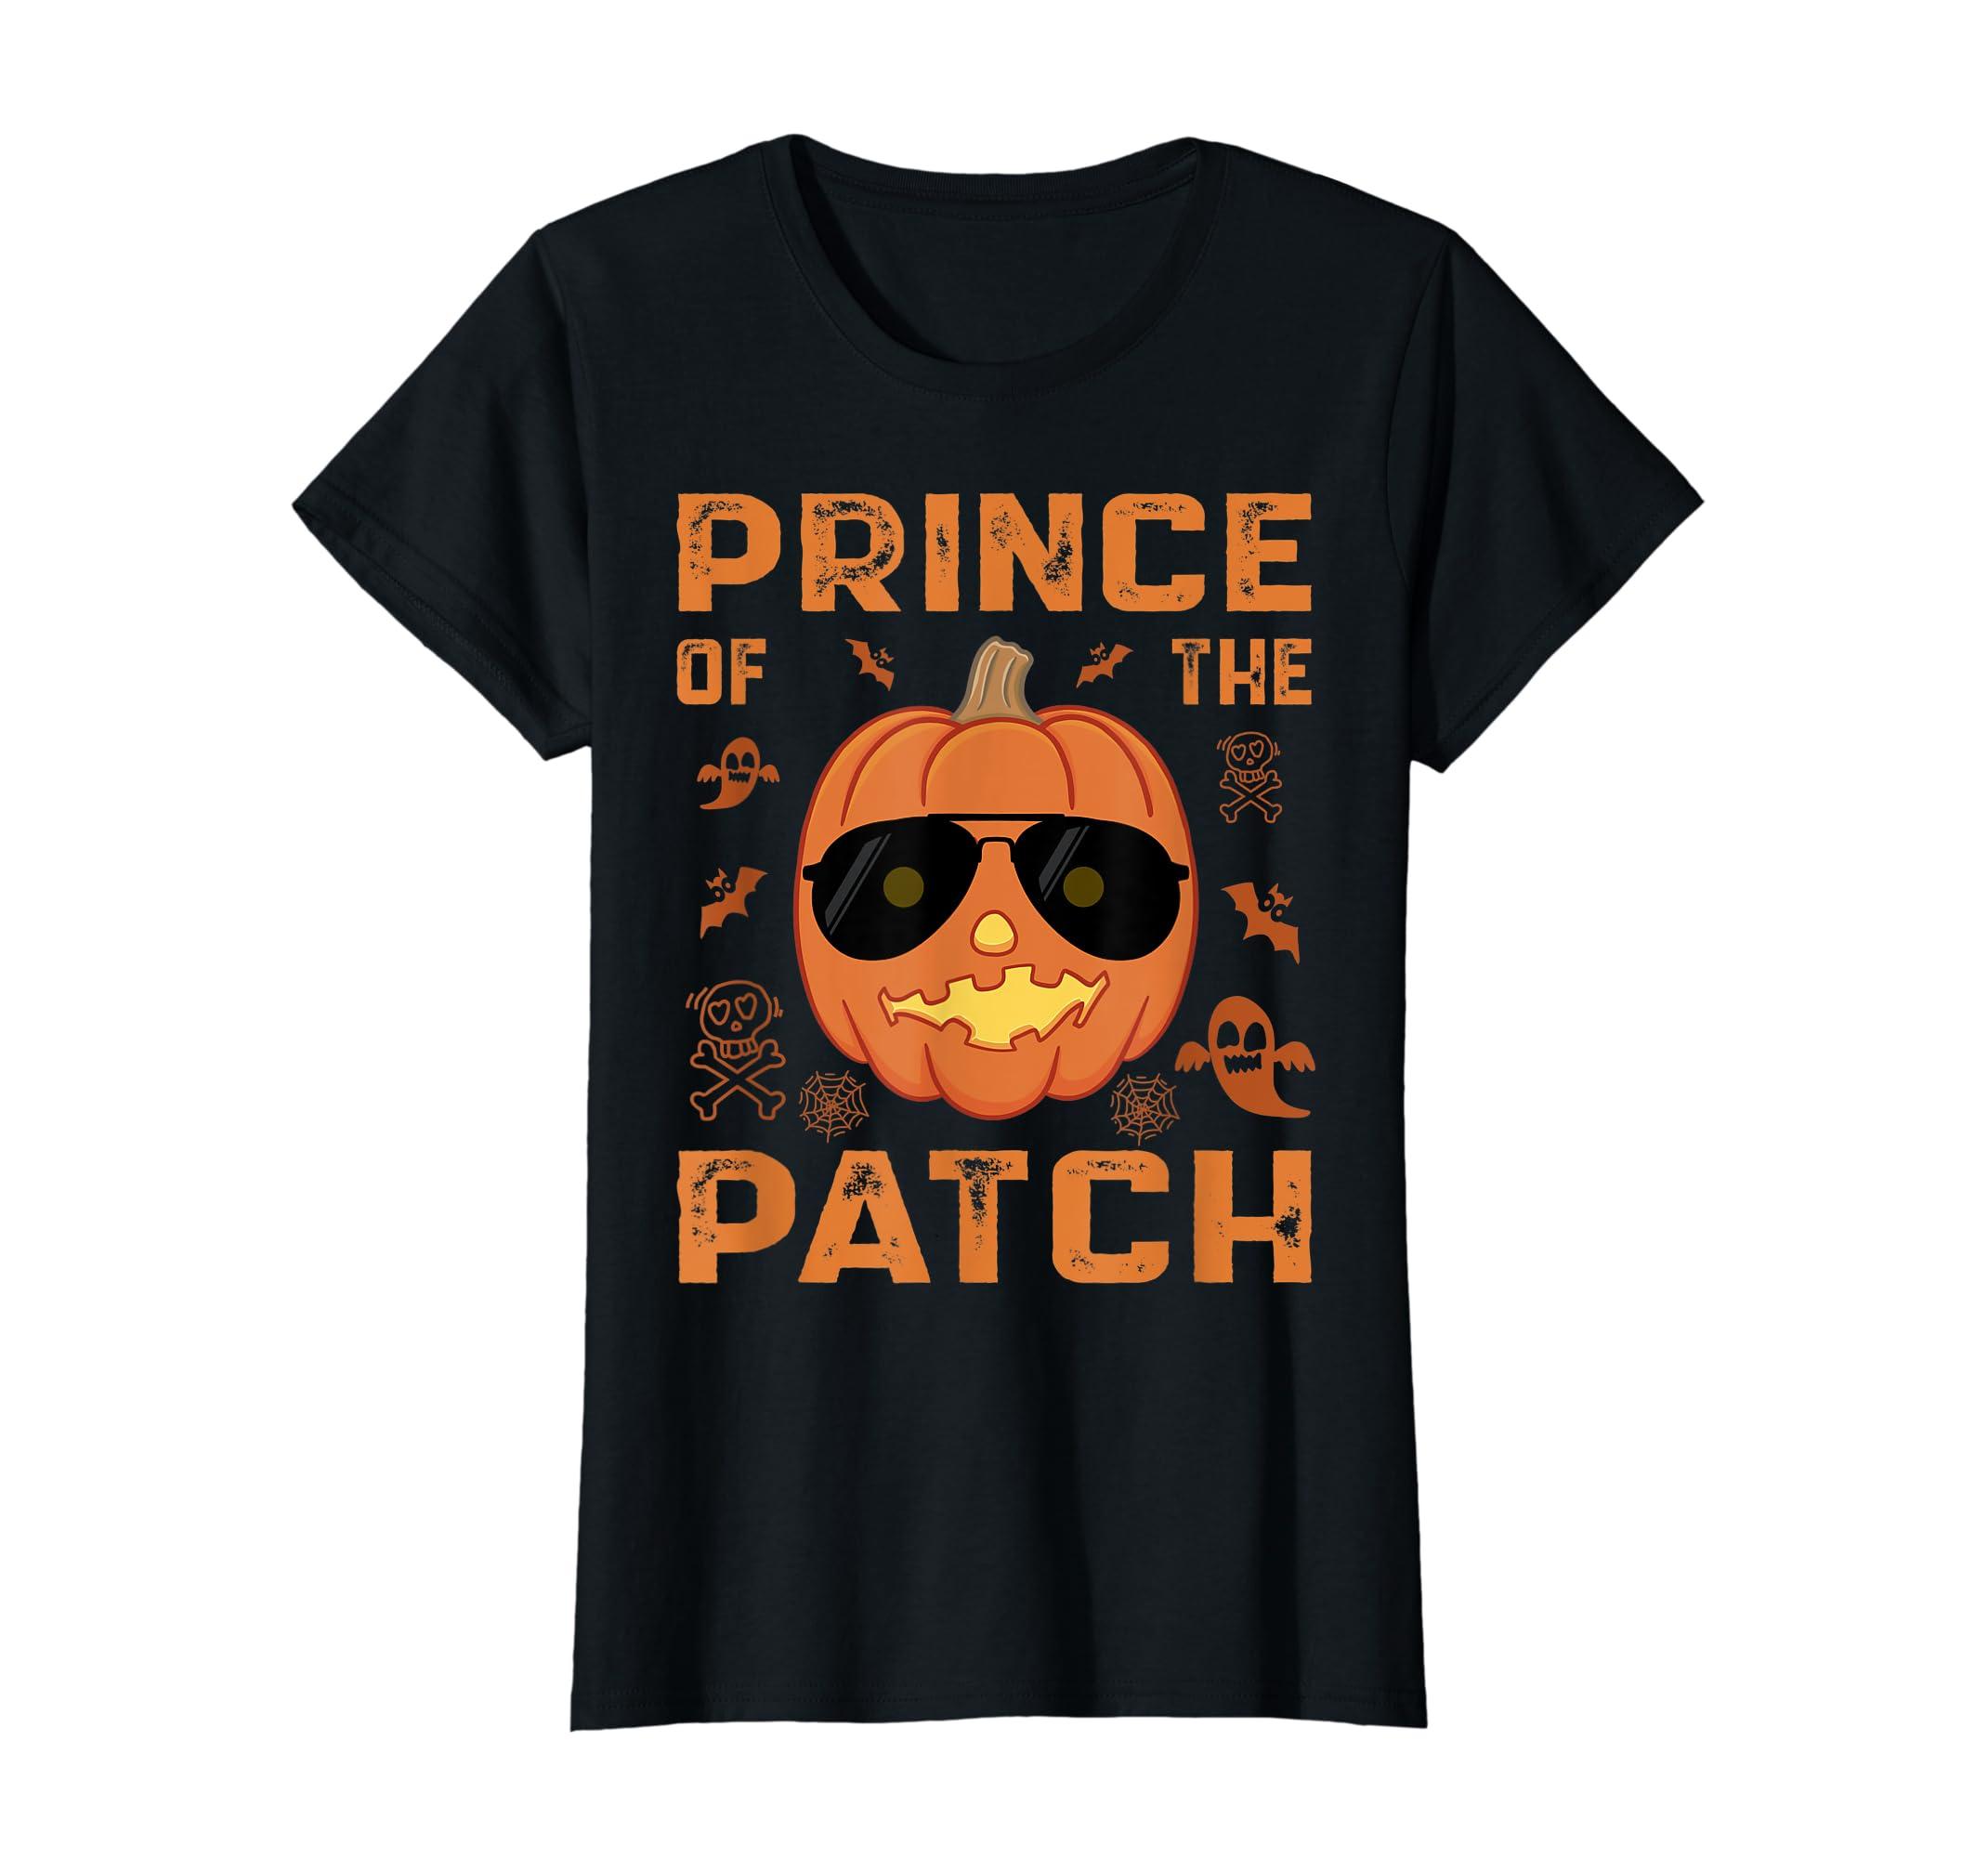 Pumpkin Prince of the Patch Group Family Halloween Costume T-Shirt-Women's T-Shirt-Black